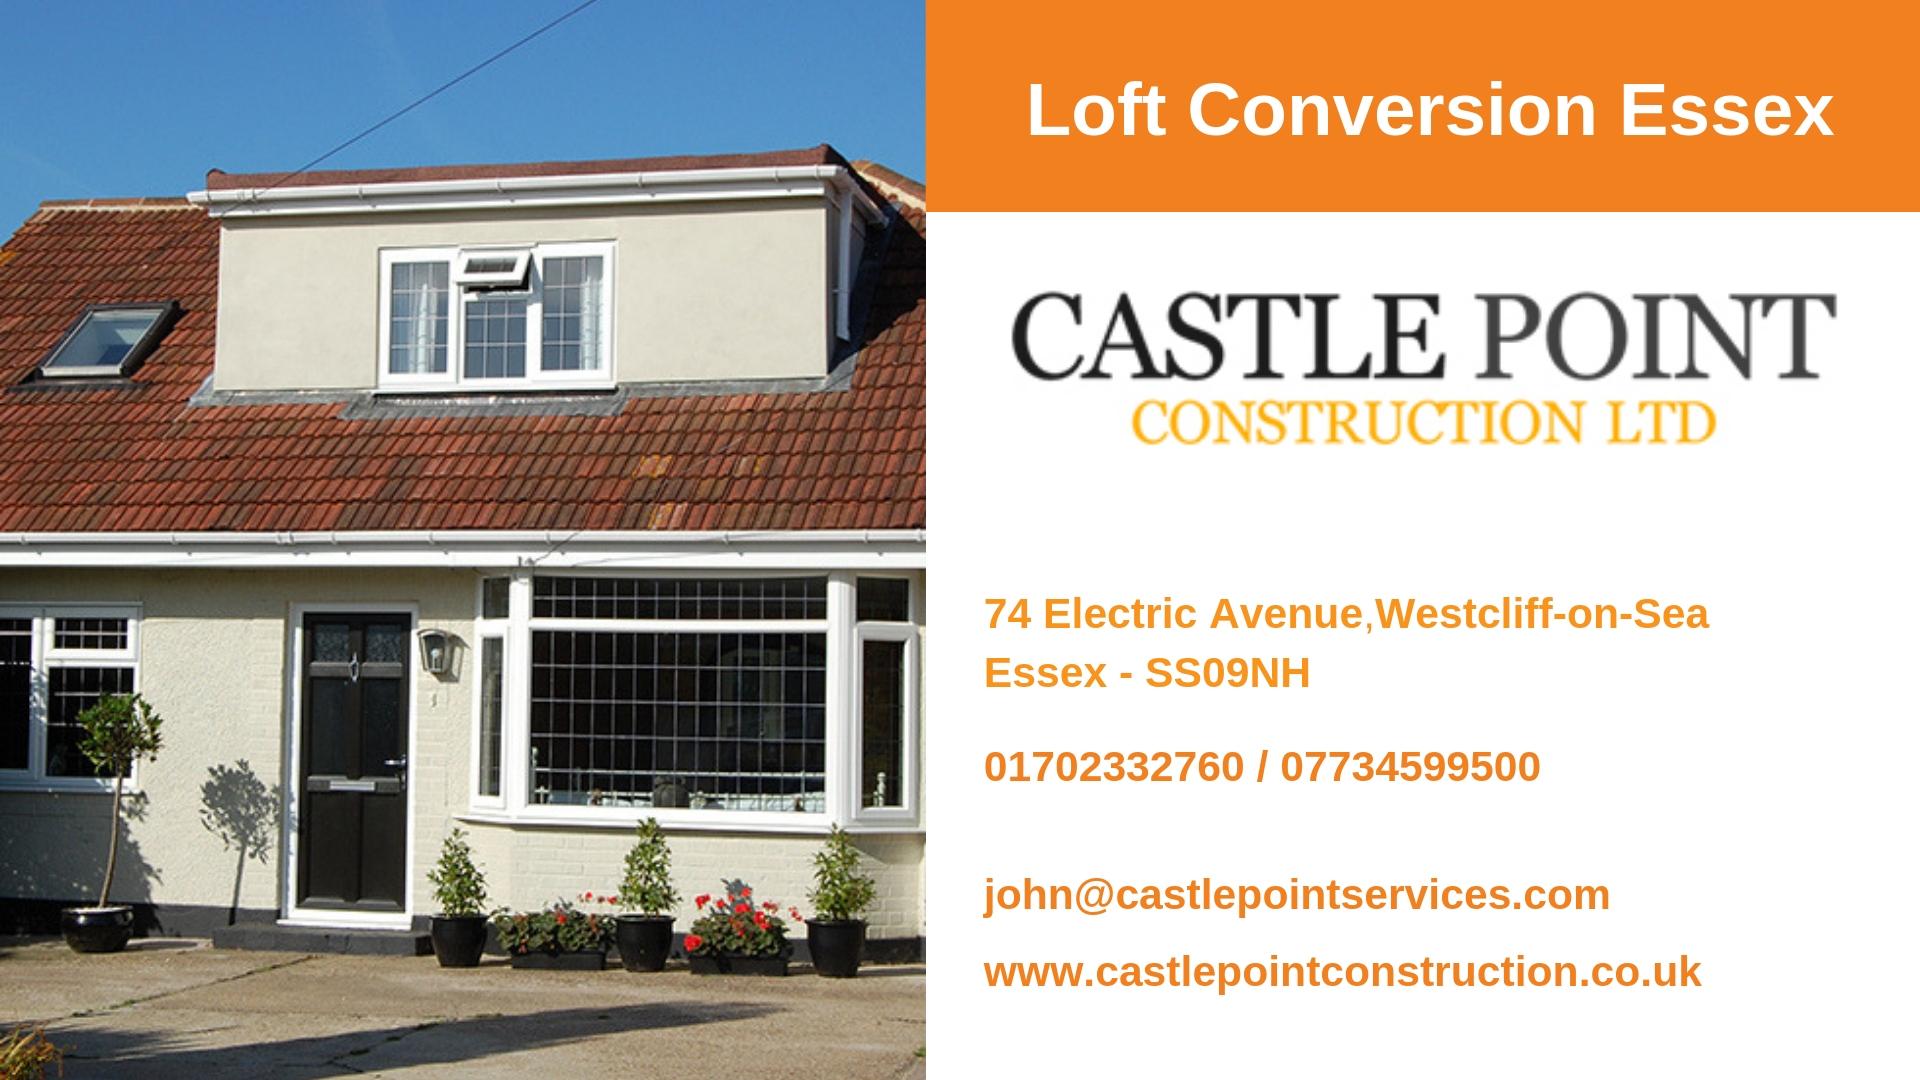 Loft Conversion Essex 1.jpg